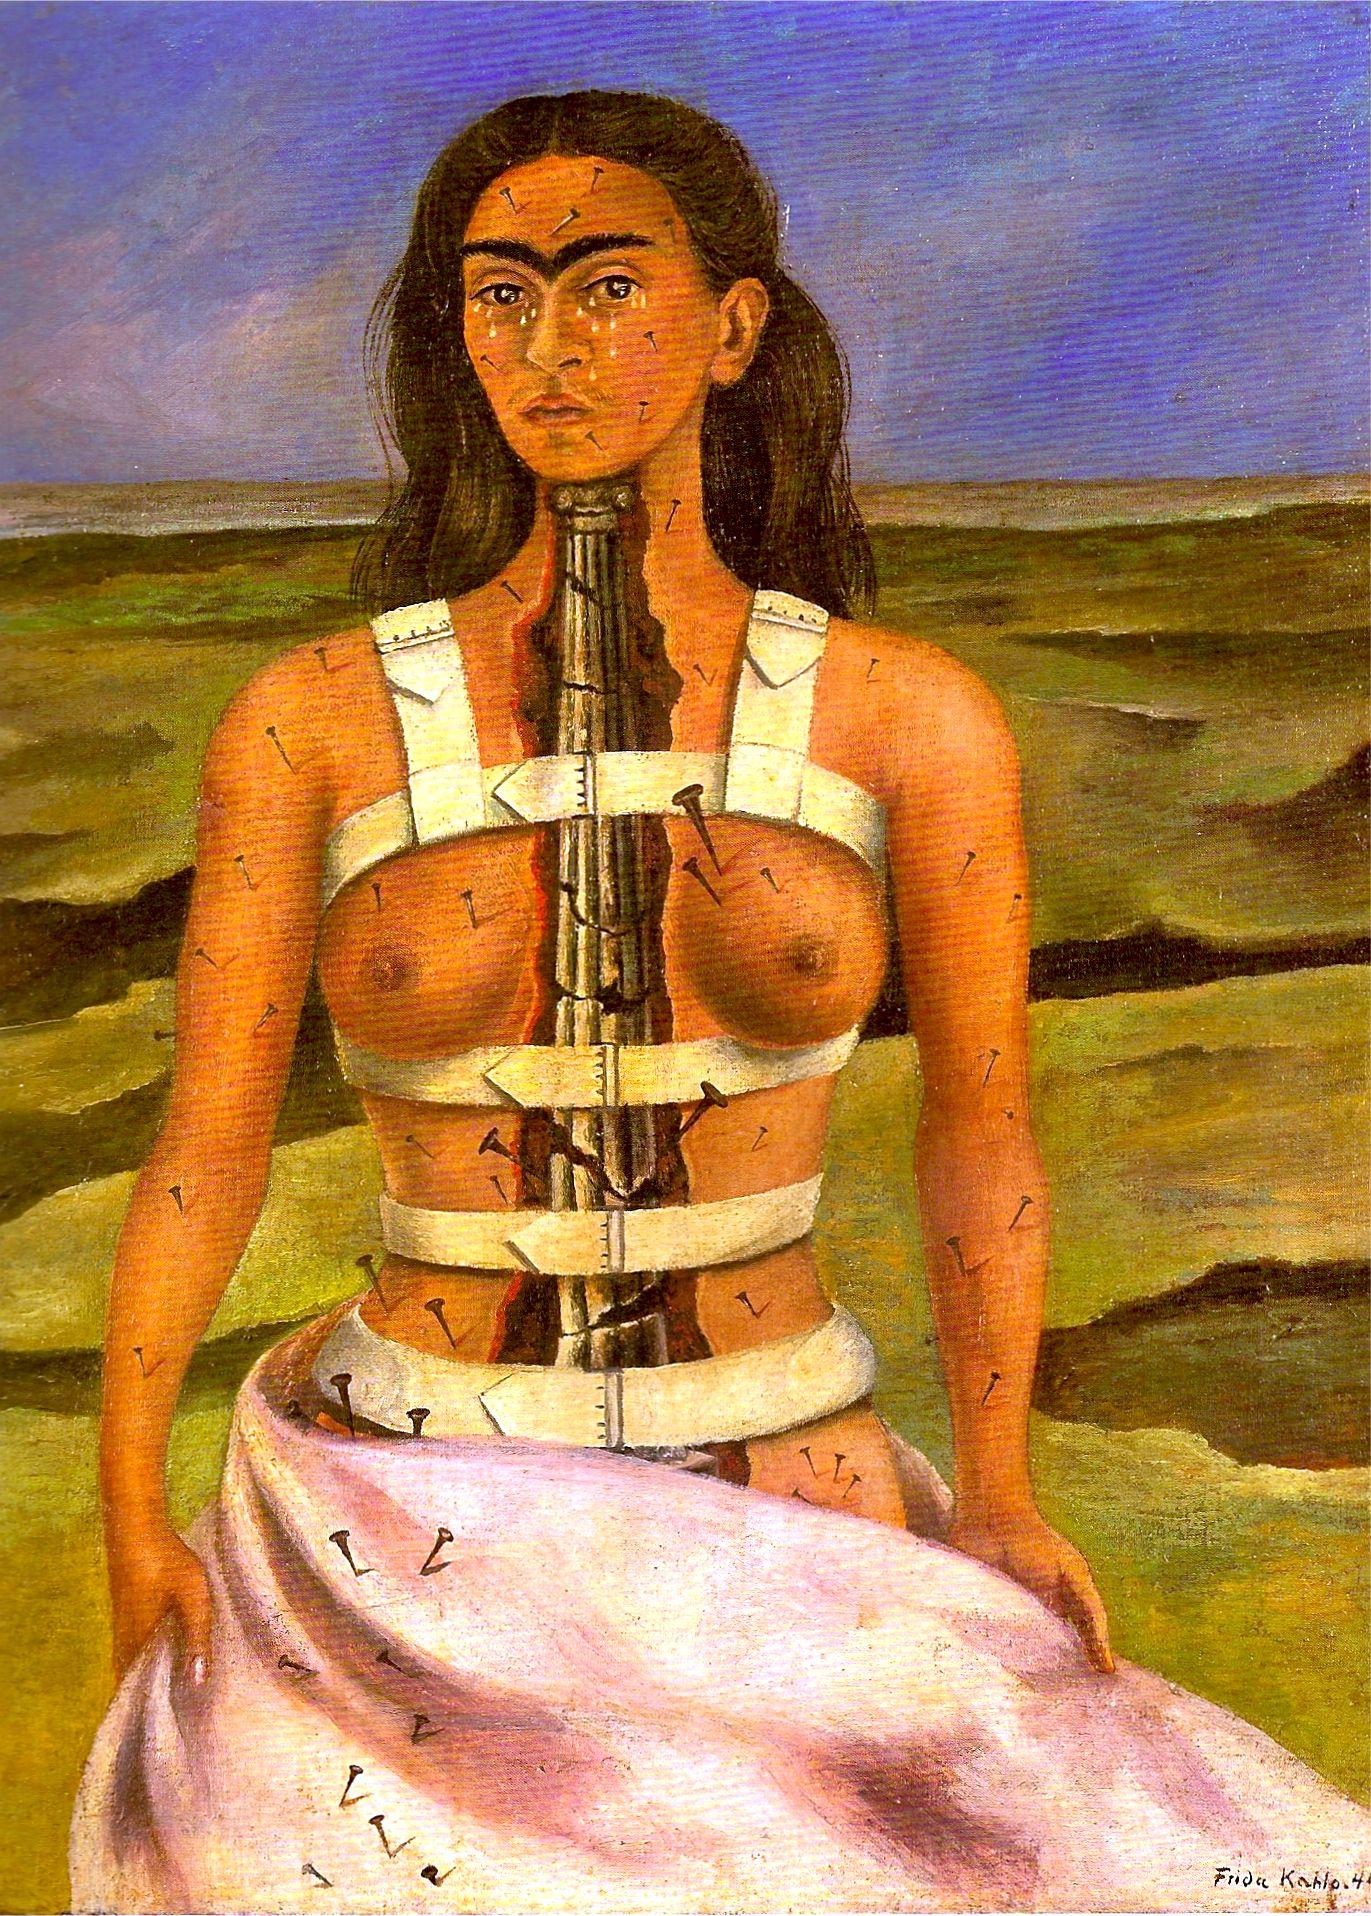 Resultado de imagen de la columna rota frida kahlo